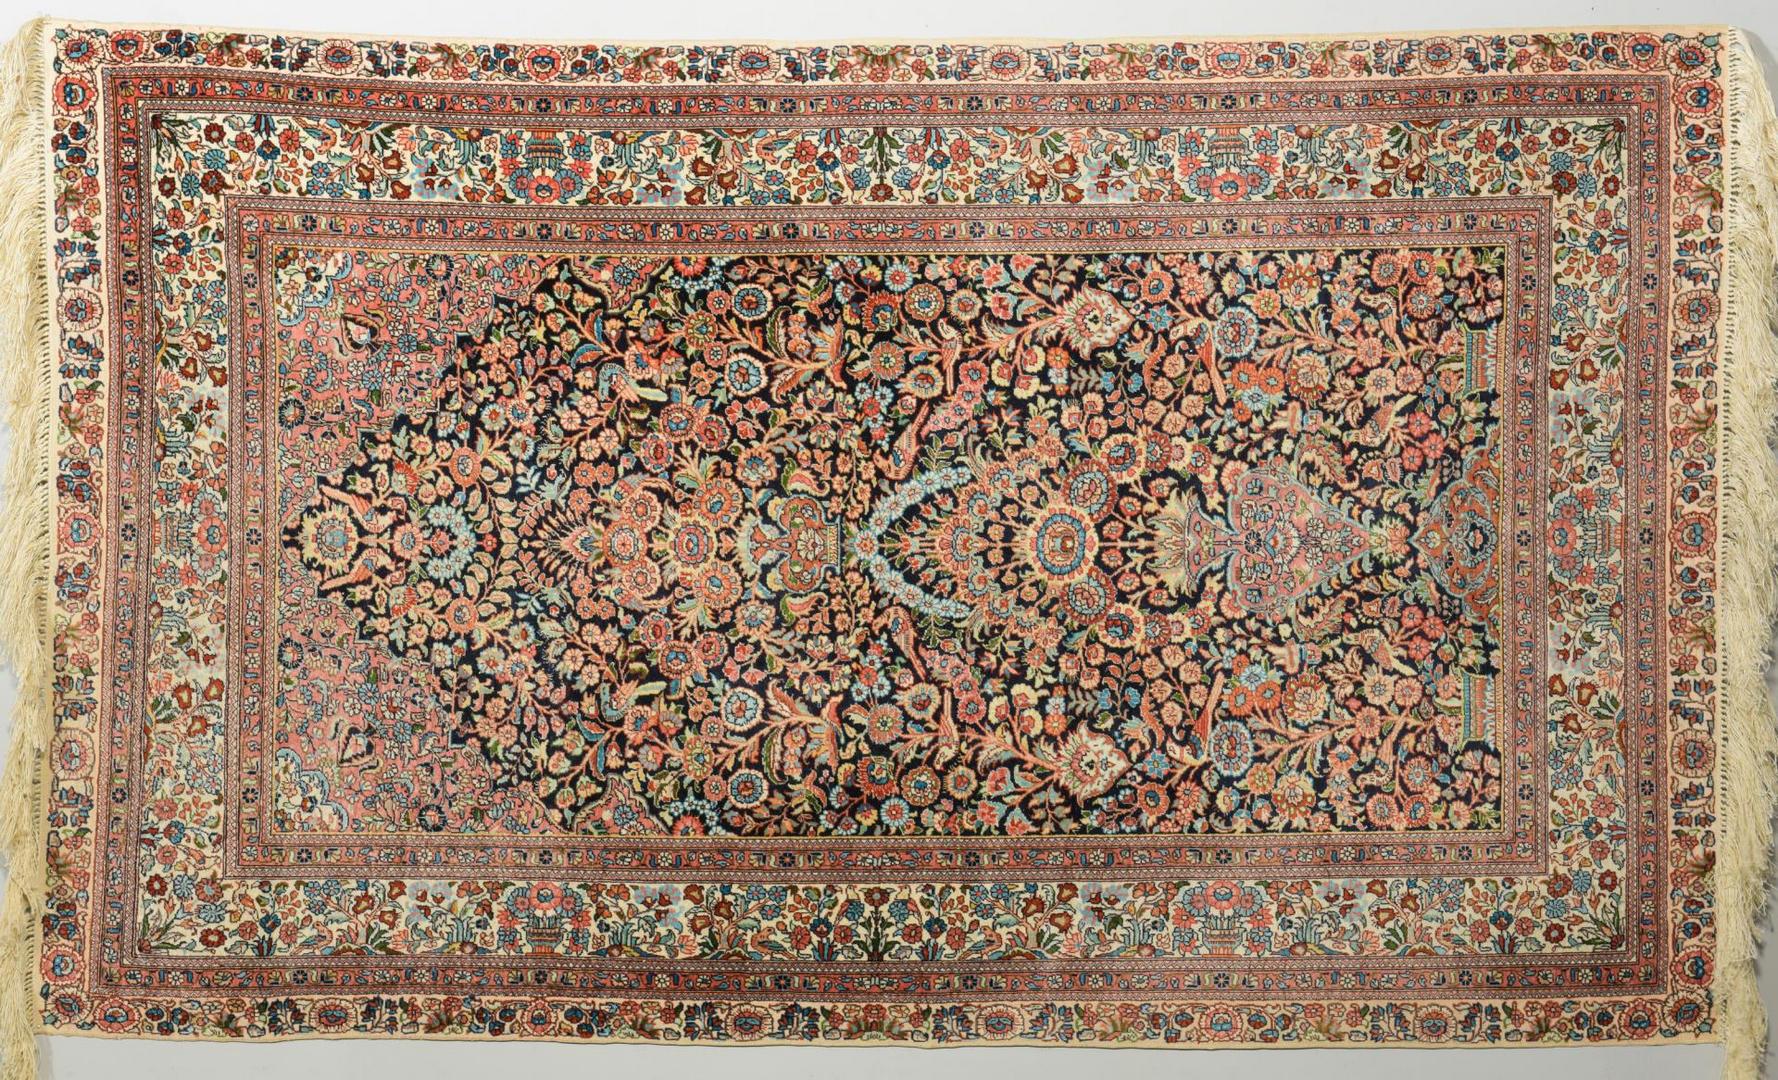 Lot 228 Silk Hereke Carpet Tree Of Life